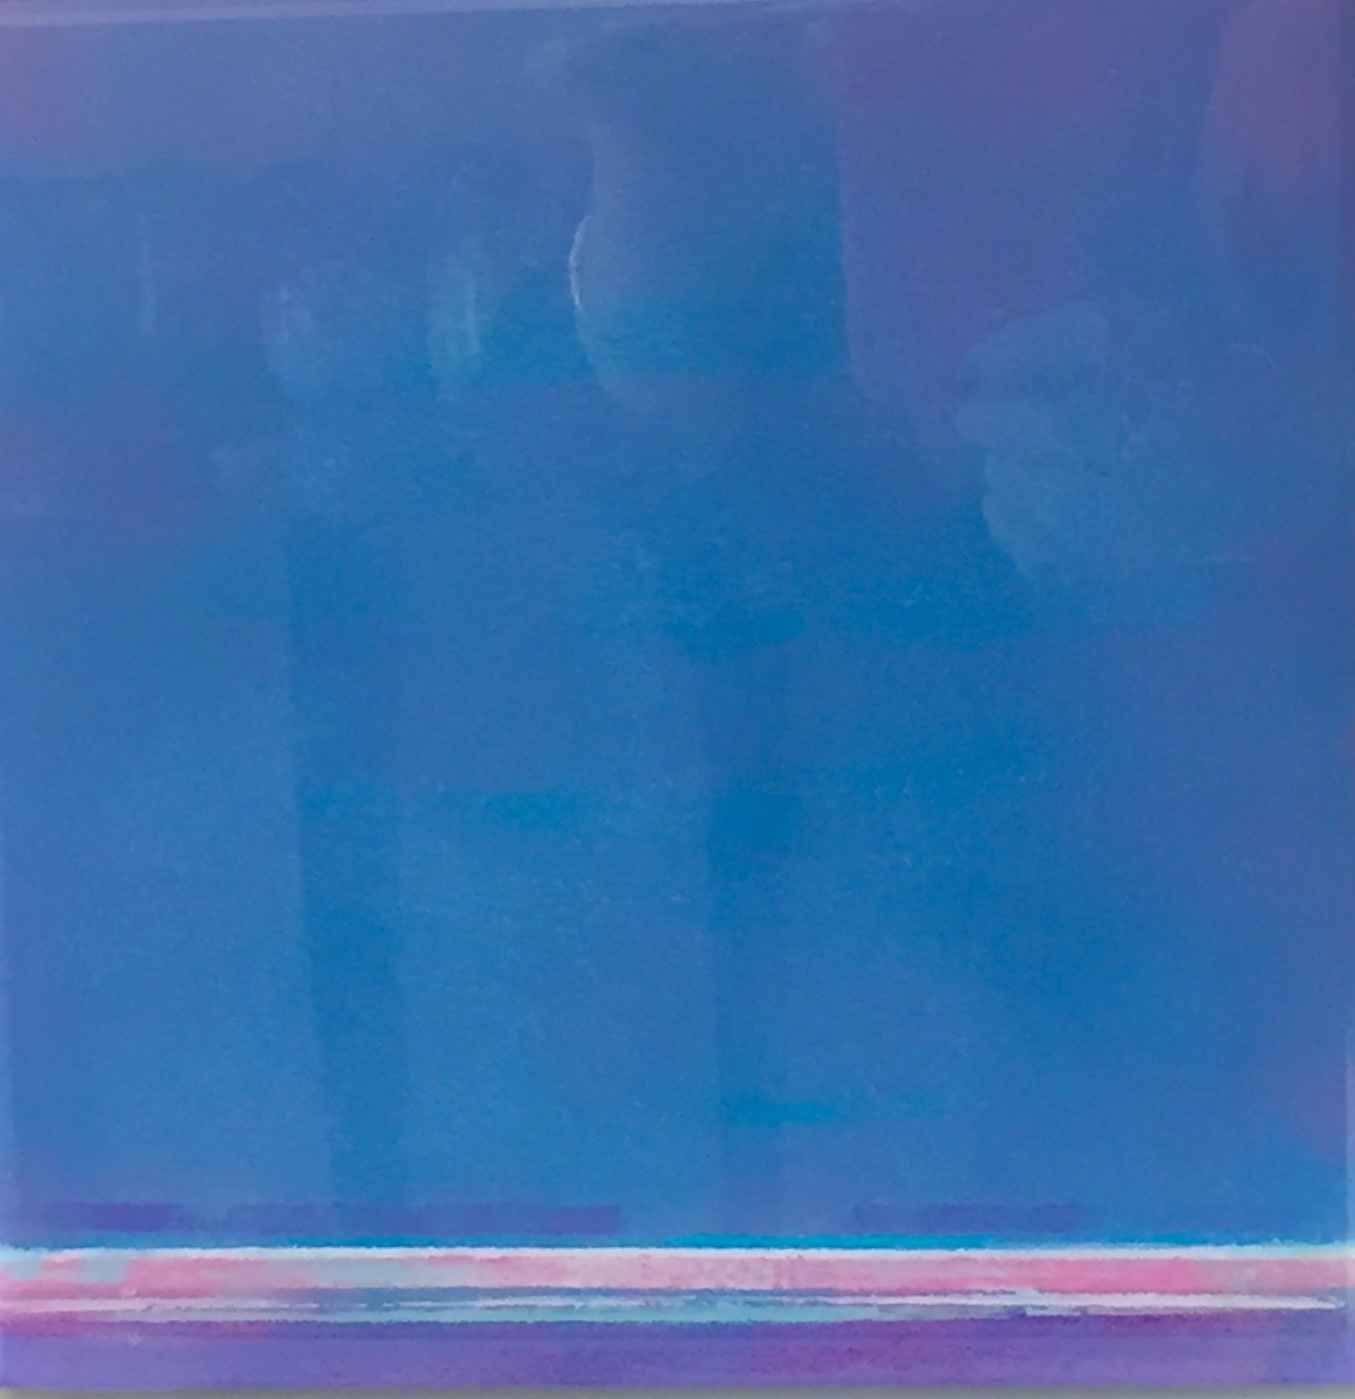 Z Periwinkle Day by  Jane Fleetwood-Morrow - Masterpiece Online